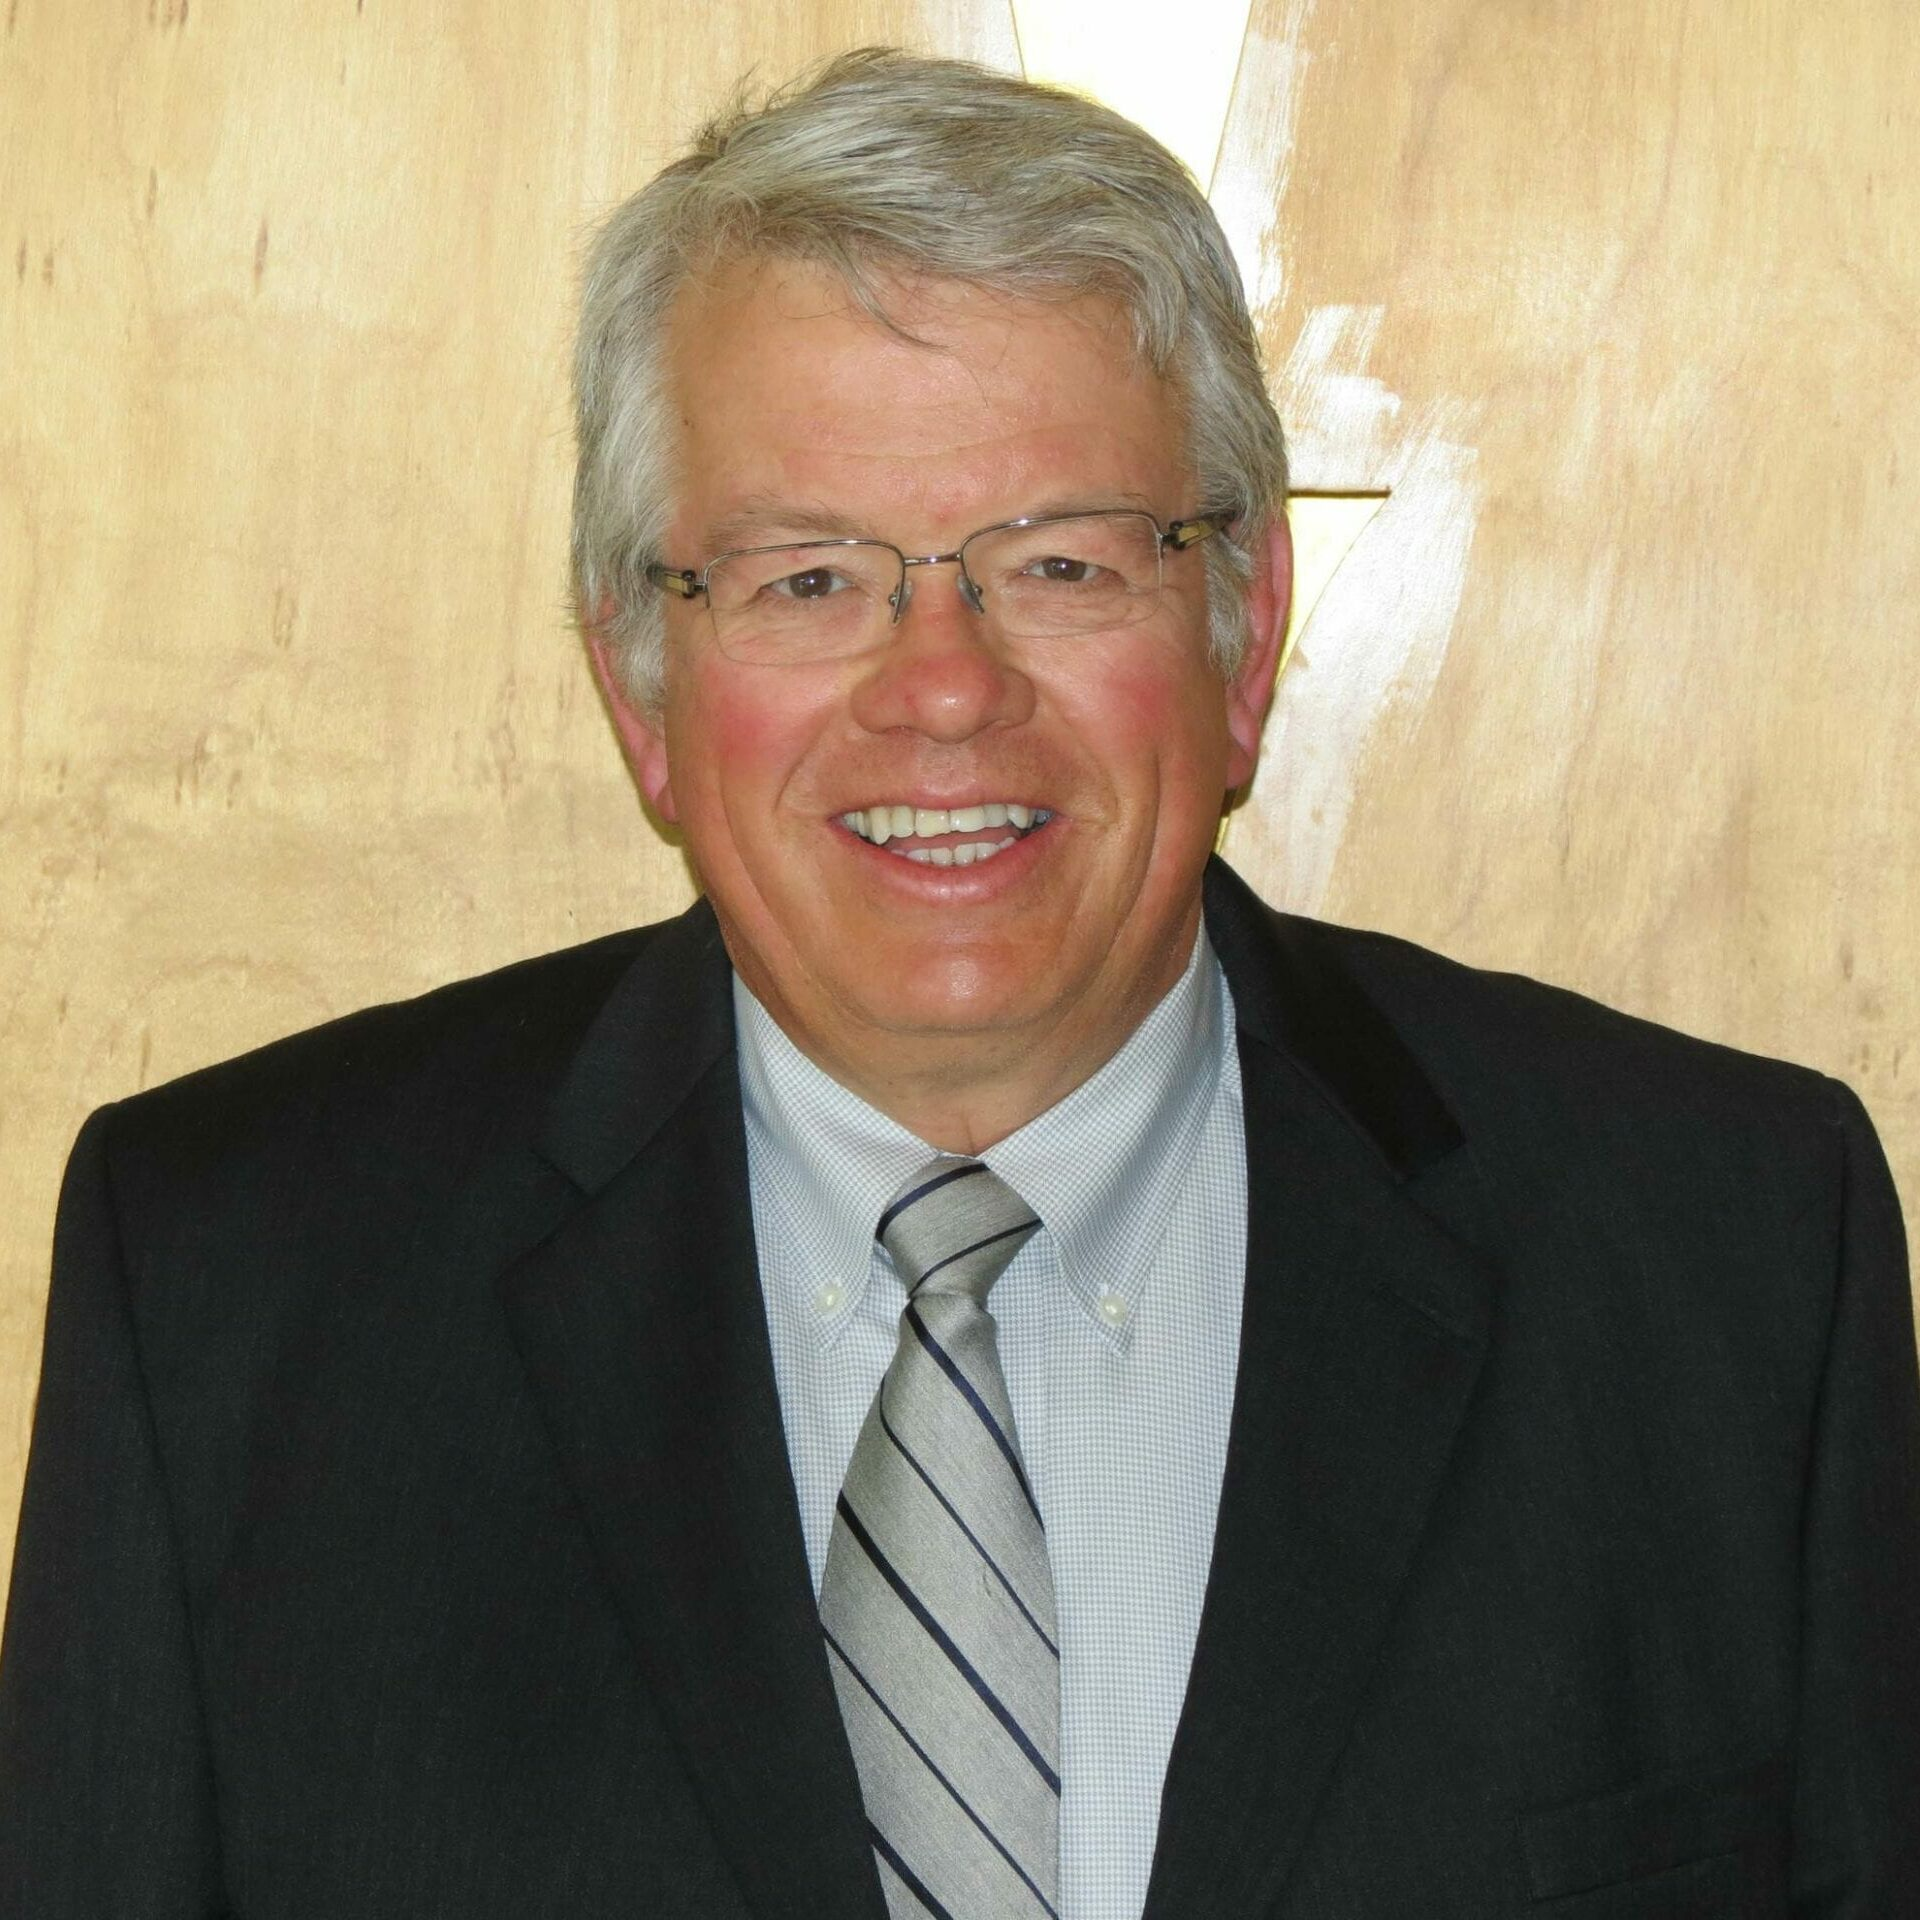 John Peterson, KoKo President & CEO